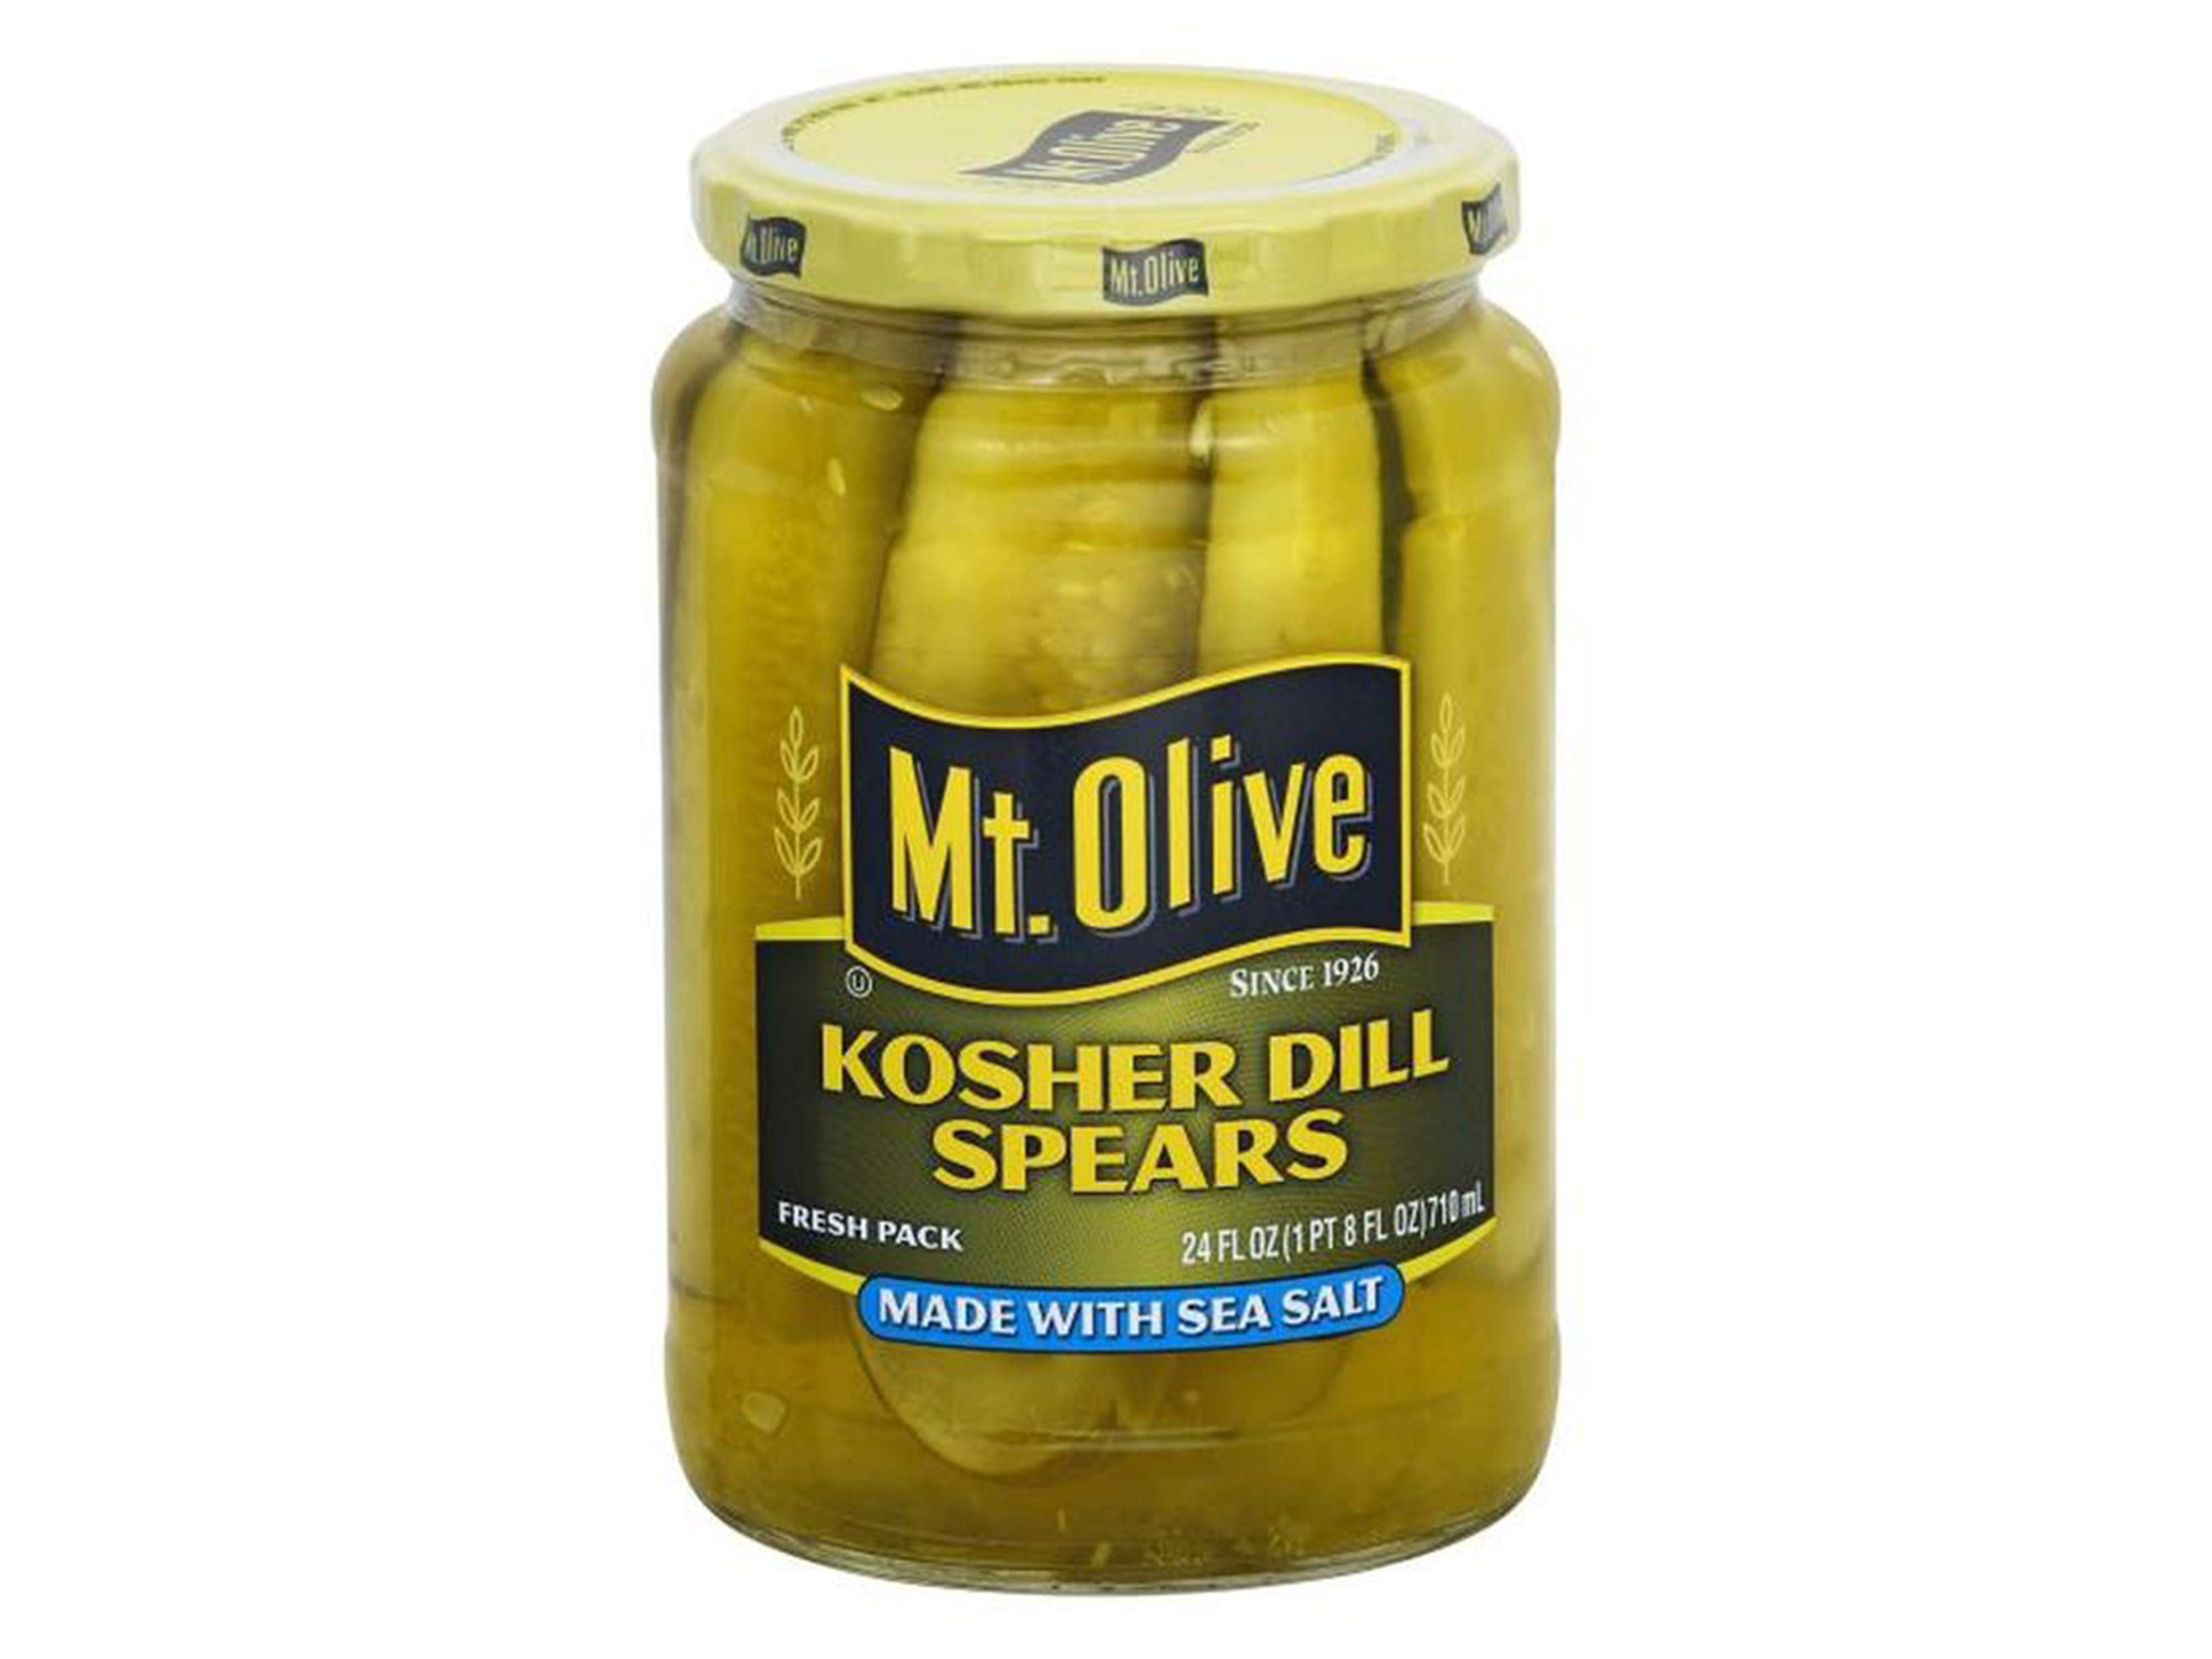 mt-olive-kosher-dill